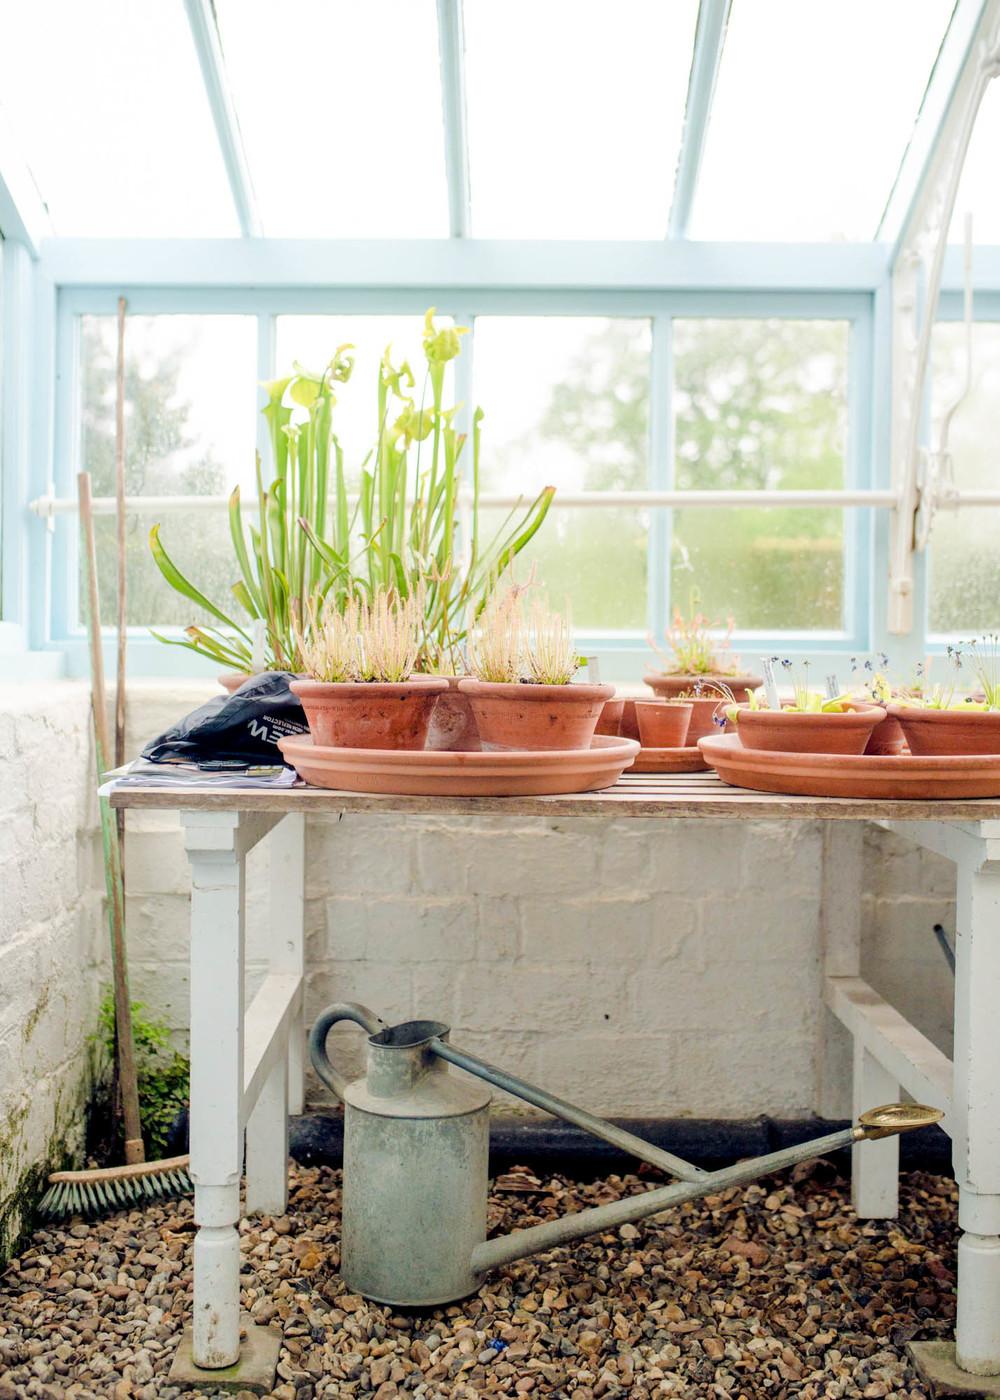 Inside Charles Darwin's greenhouse